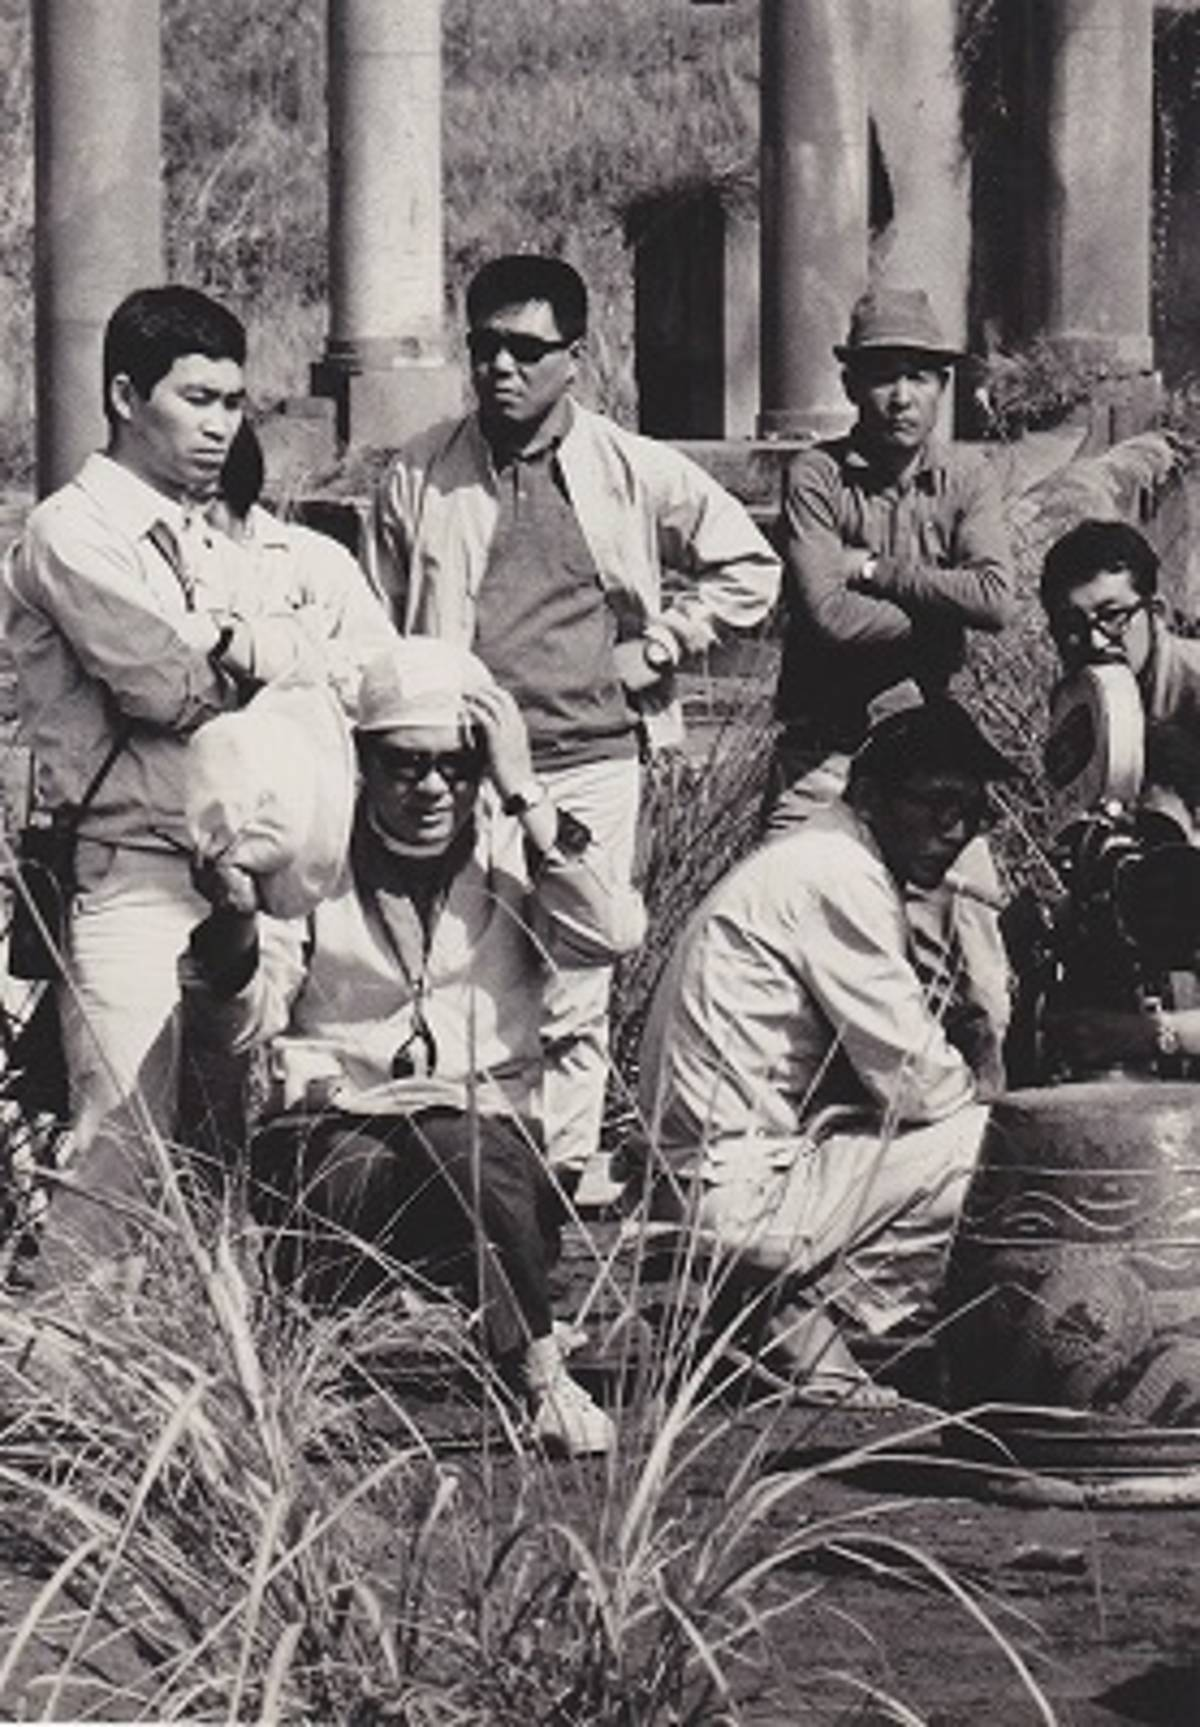 Редкое фото обоих режиссеров на съемках: Вакамацу - в кресле, Адачи - крайний слева